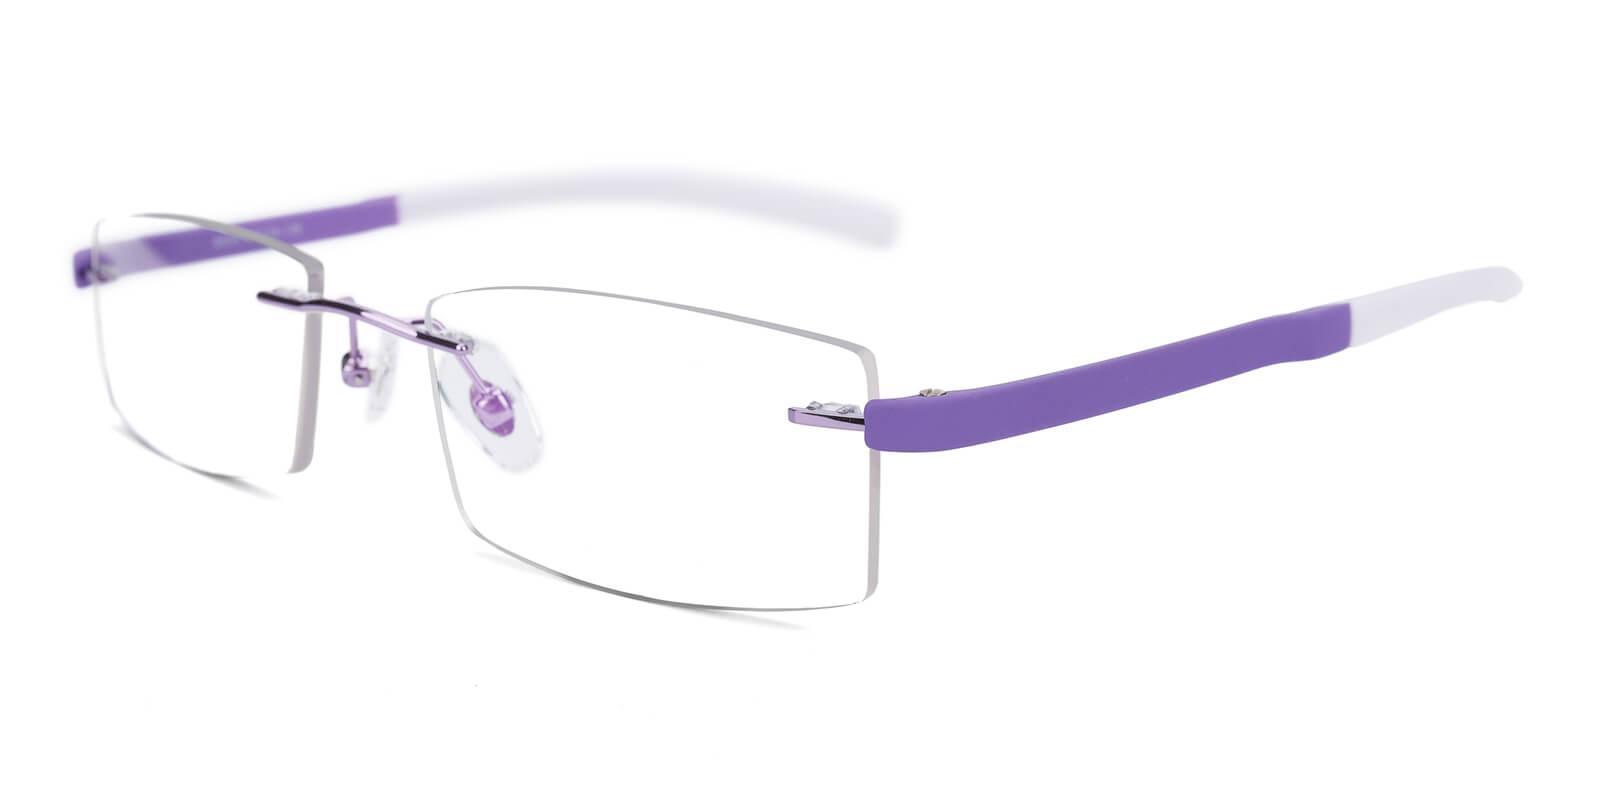 Trimming-Purple-Varieties-Acetate / Metal-Eyeglasses-additional1